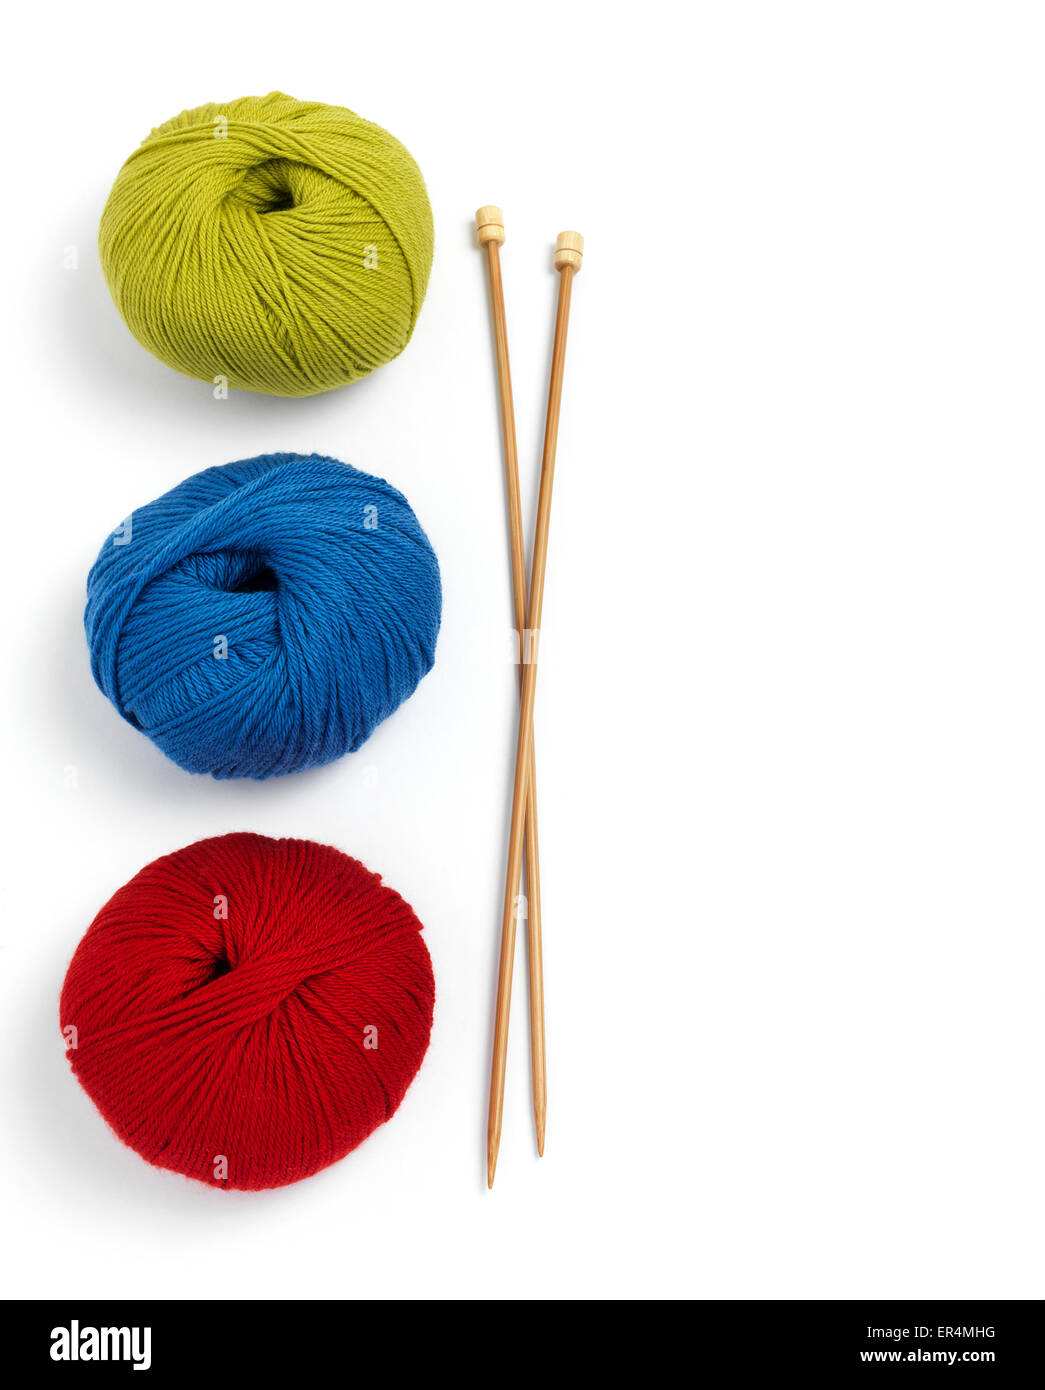 Balls of wool - Stock Image